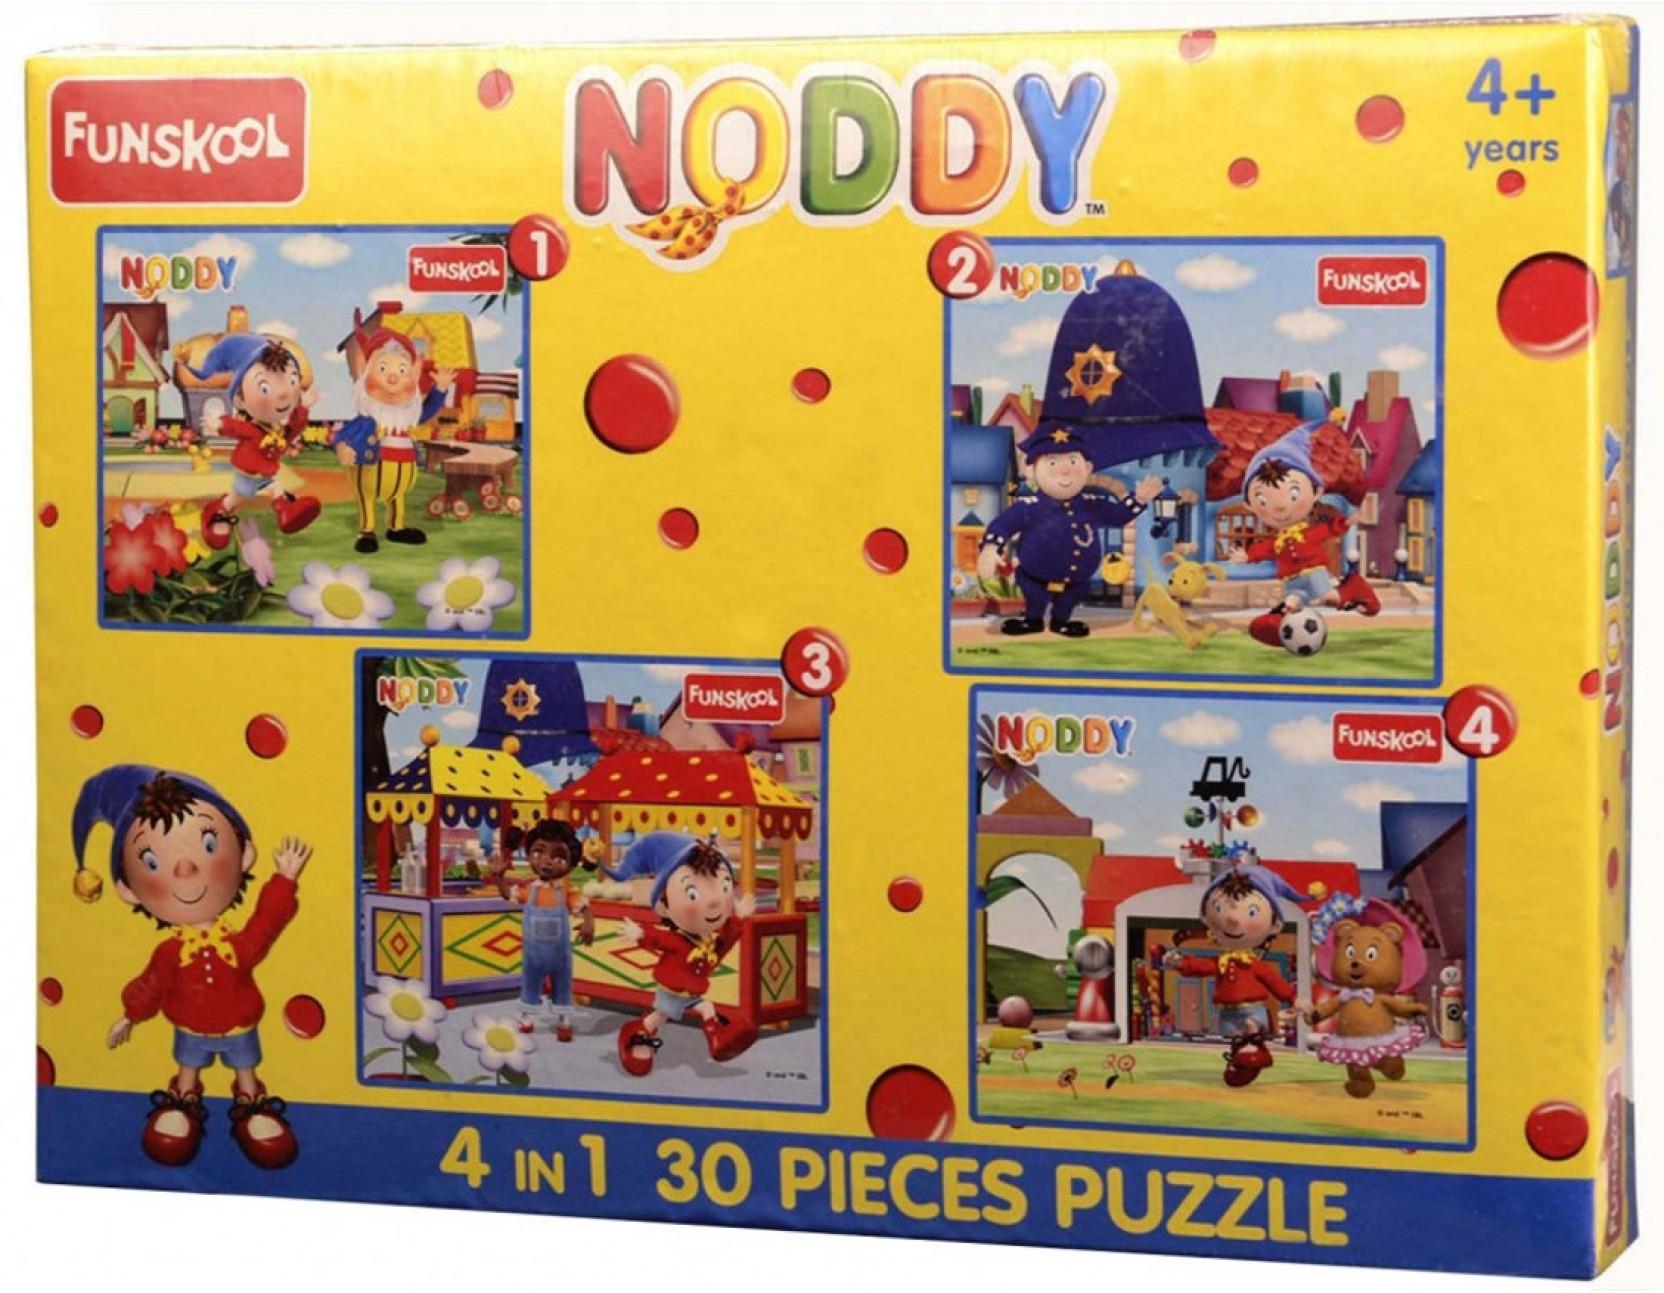 87f545d8cd Funskool 4 in 1 Puzzle - Noddy - 4 in 1 Puzzle - Noddy . Buy Noddy ...